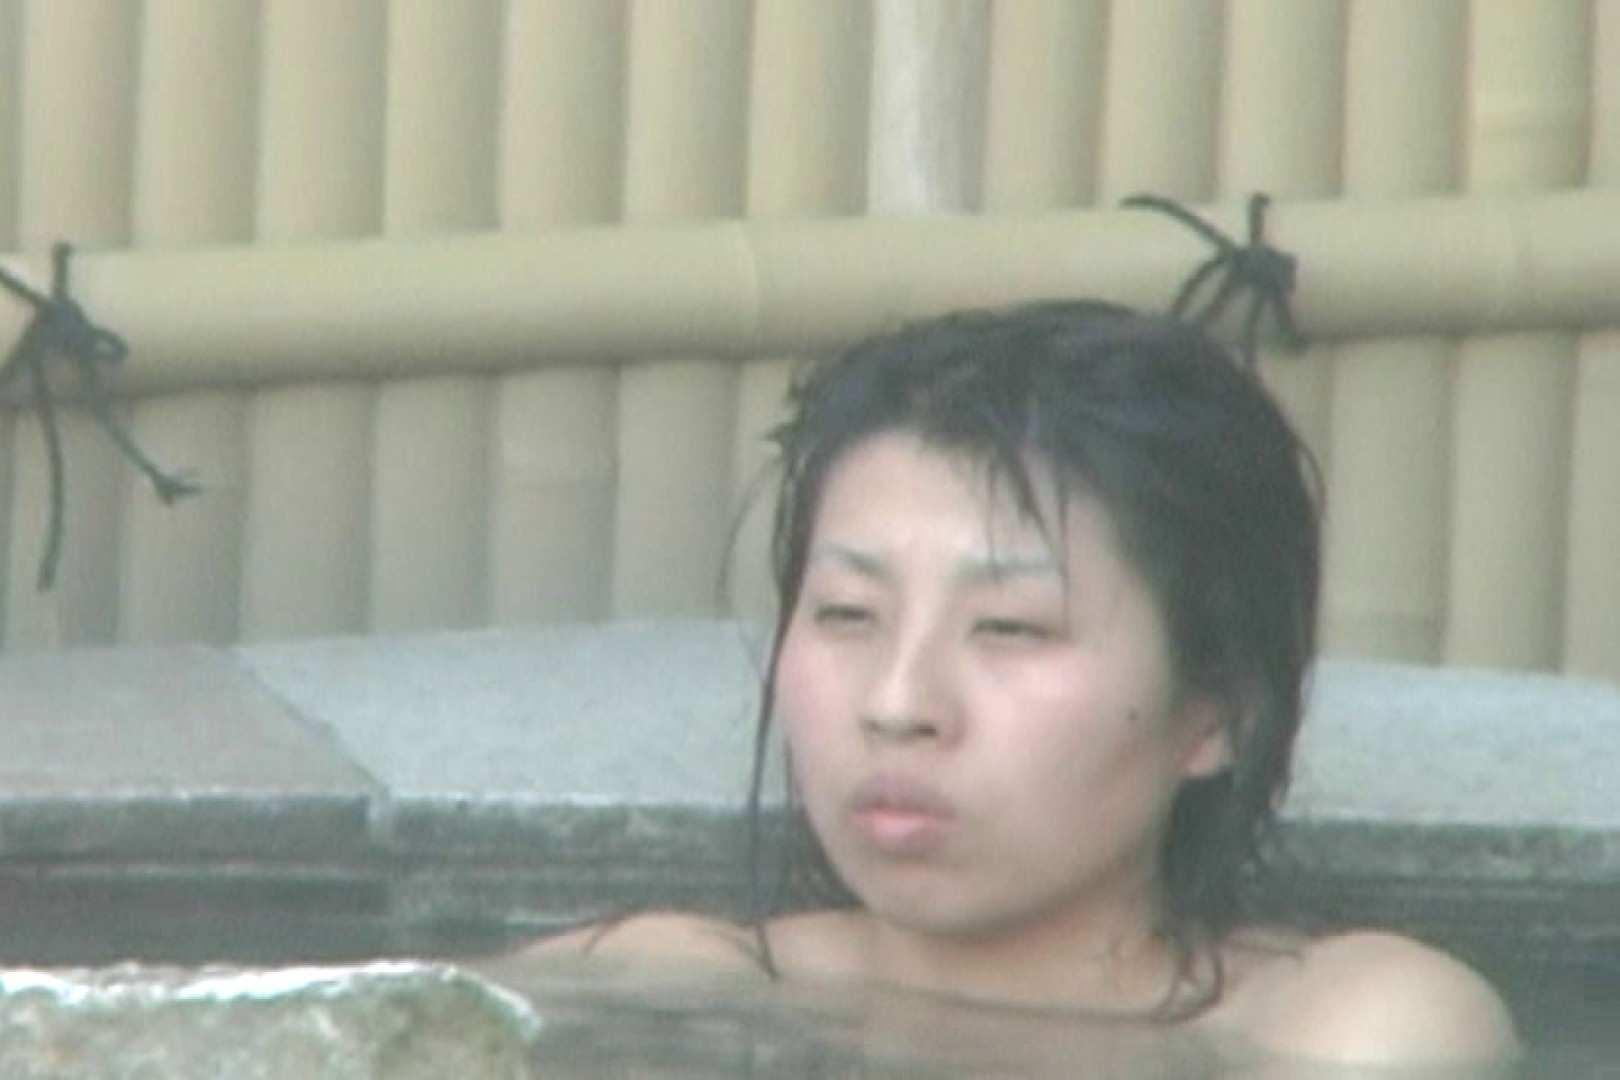 Aquaな露天風呂Vol.589 盗撮 | HなOL  105pic 48